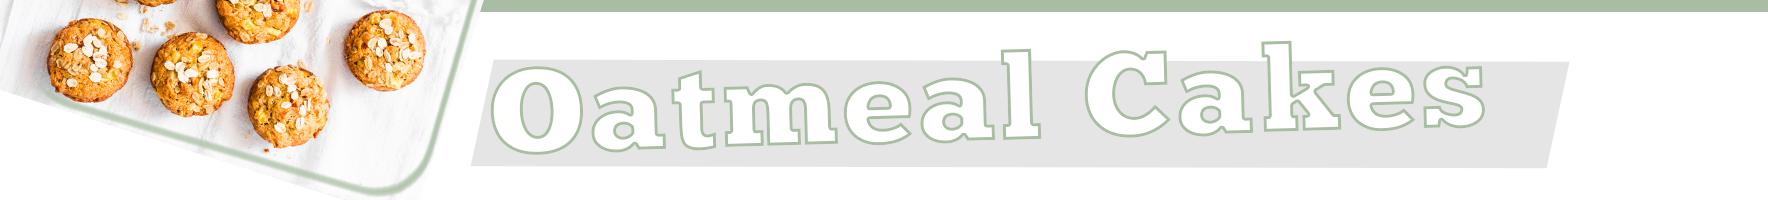 OatmealCakes